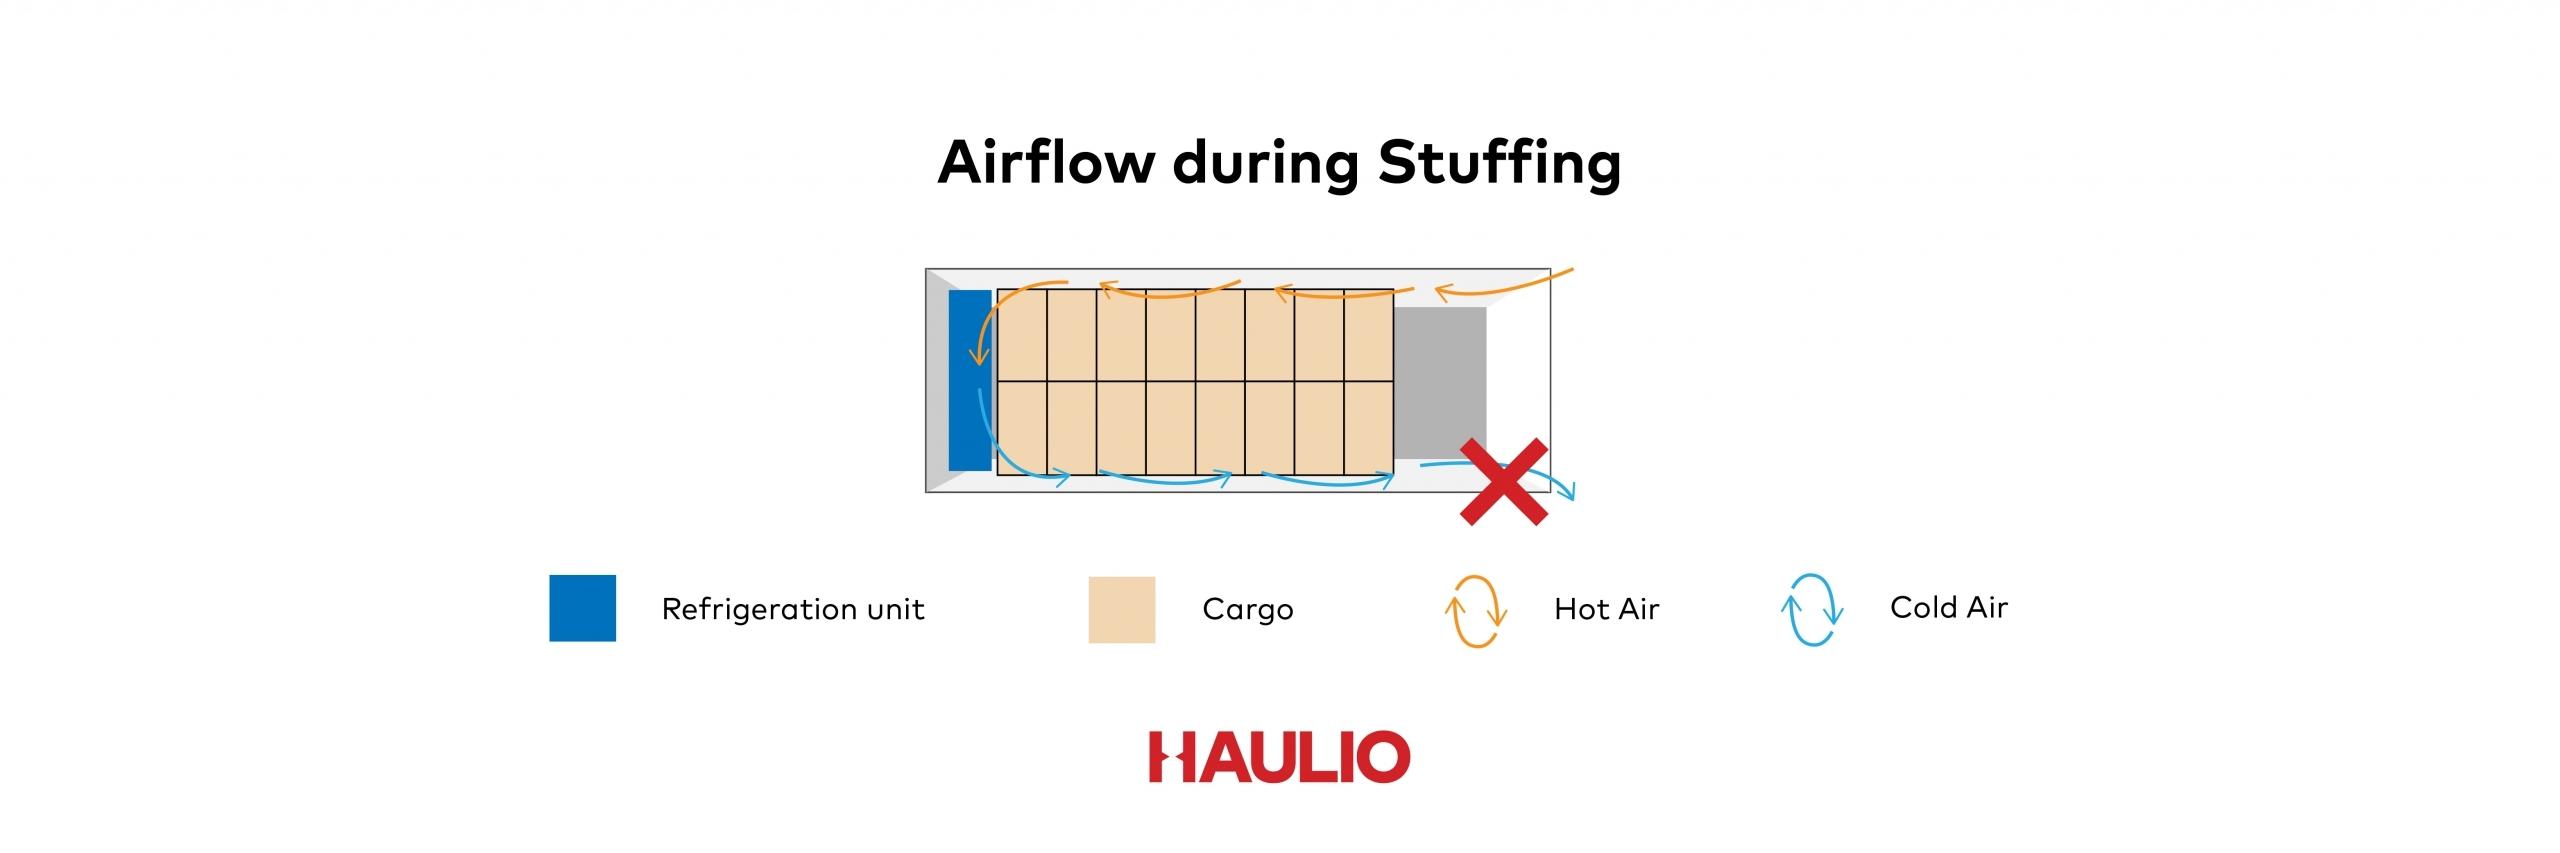 Reefer Airflow during Stuffing